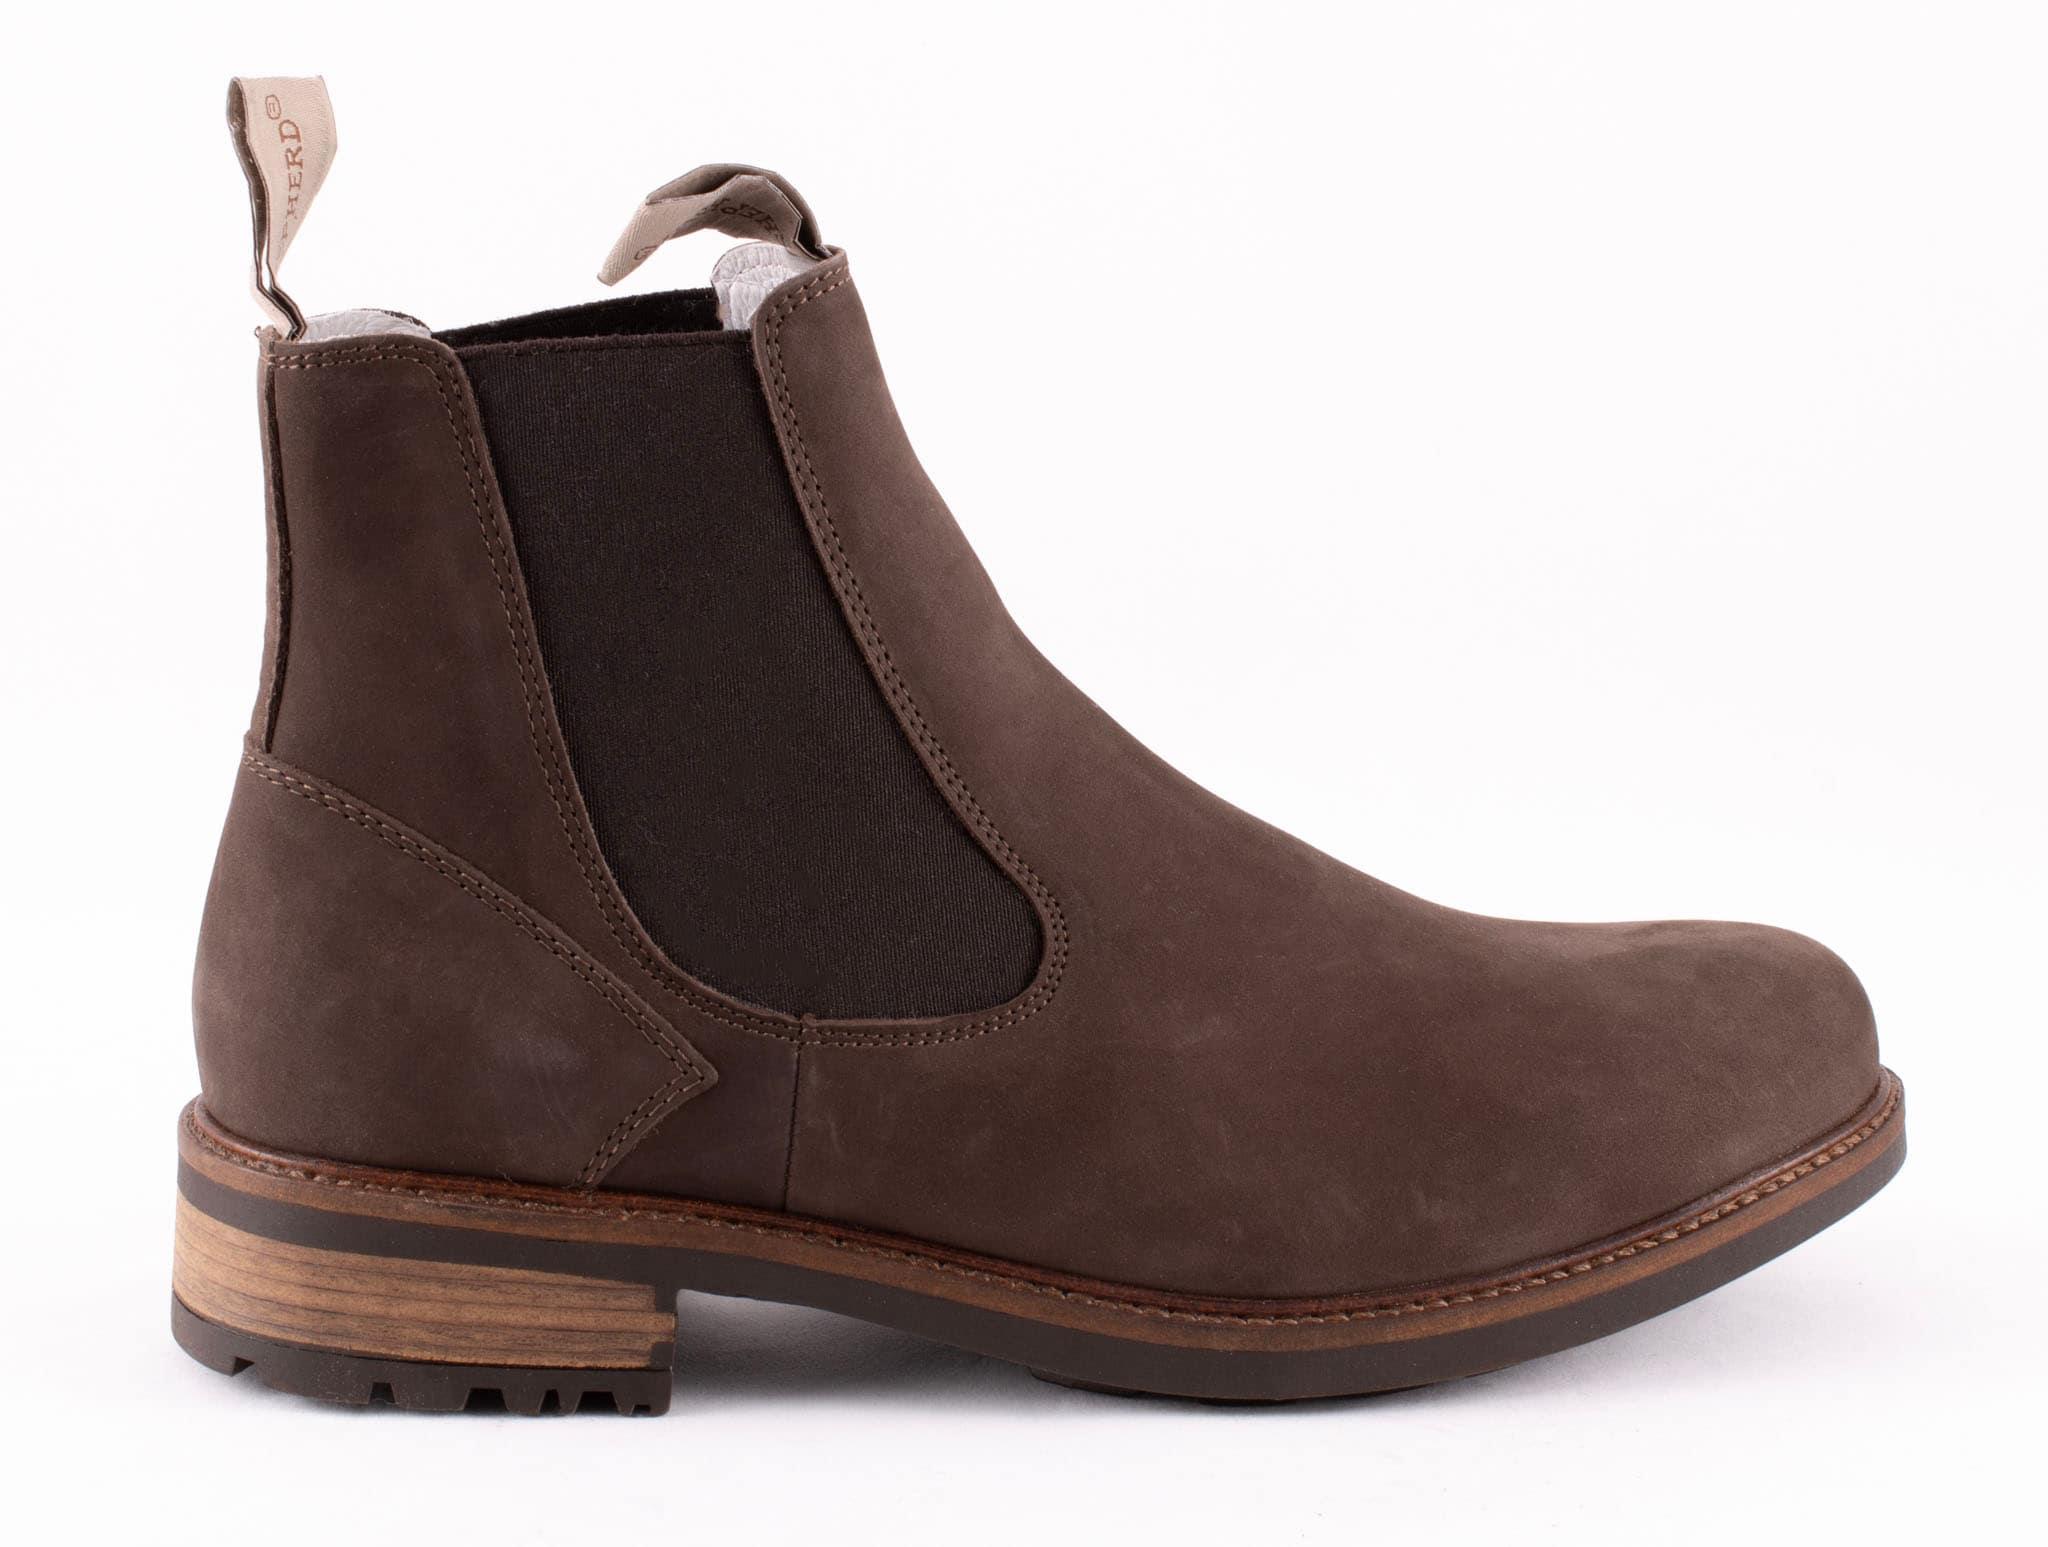 Shepherd Kevin boots